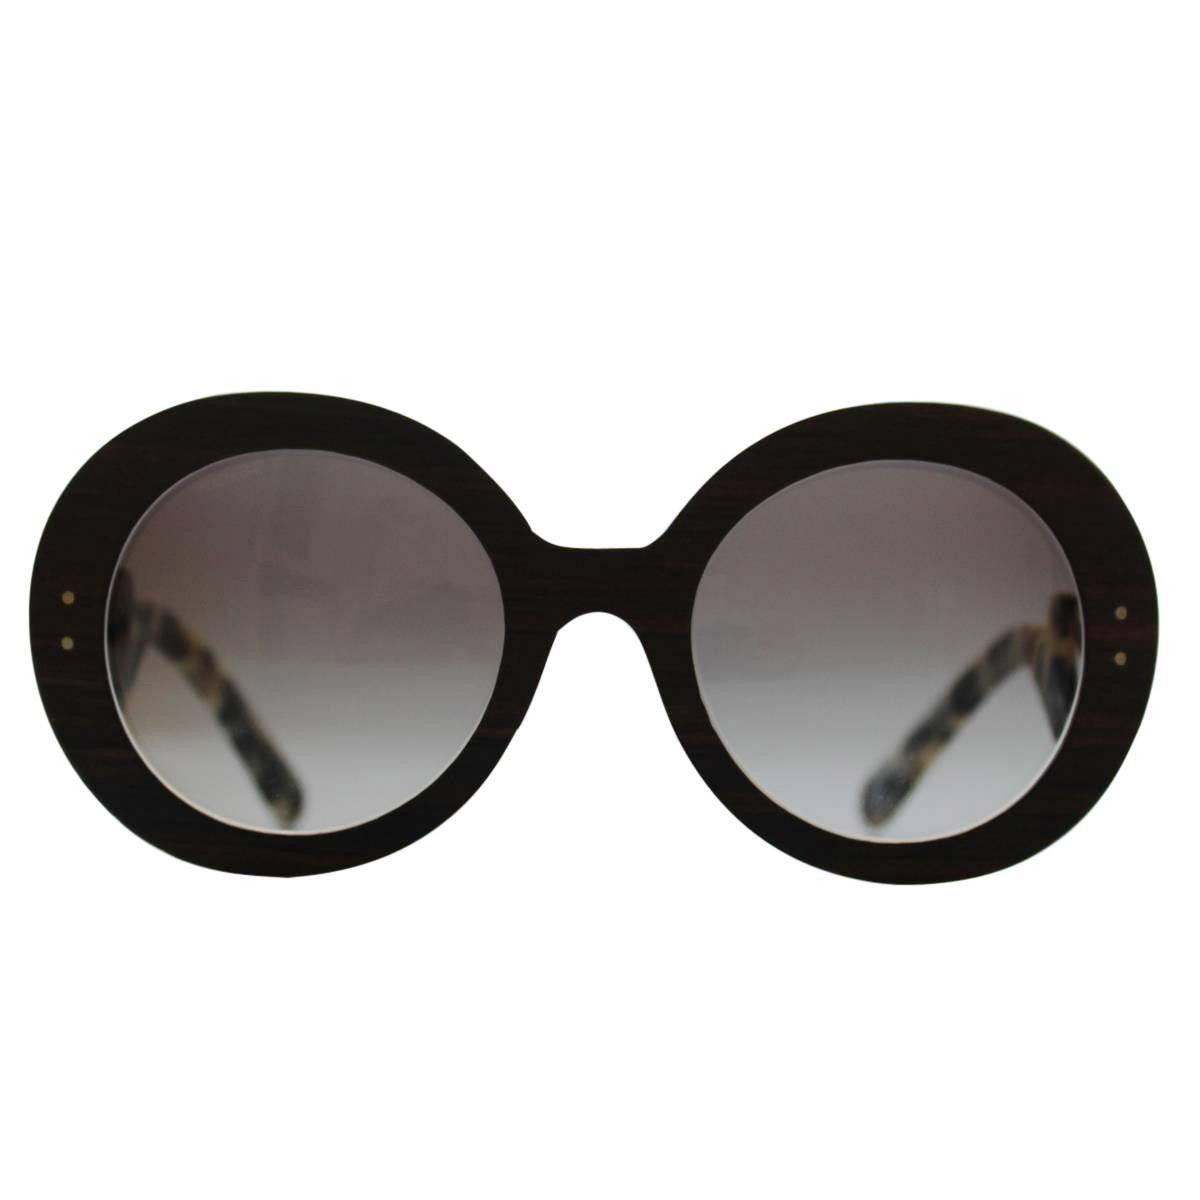 1ba6d19407 Prada Converted Sunglasses - Prada Baroque New Collection Available Prada  OPR27RS Wood Baroque Sunglasses at 1stdibs